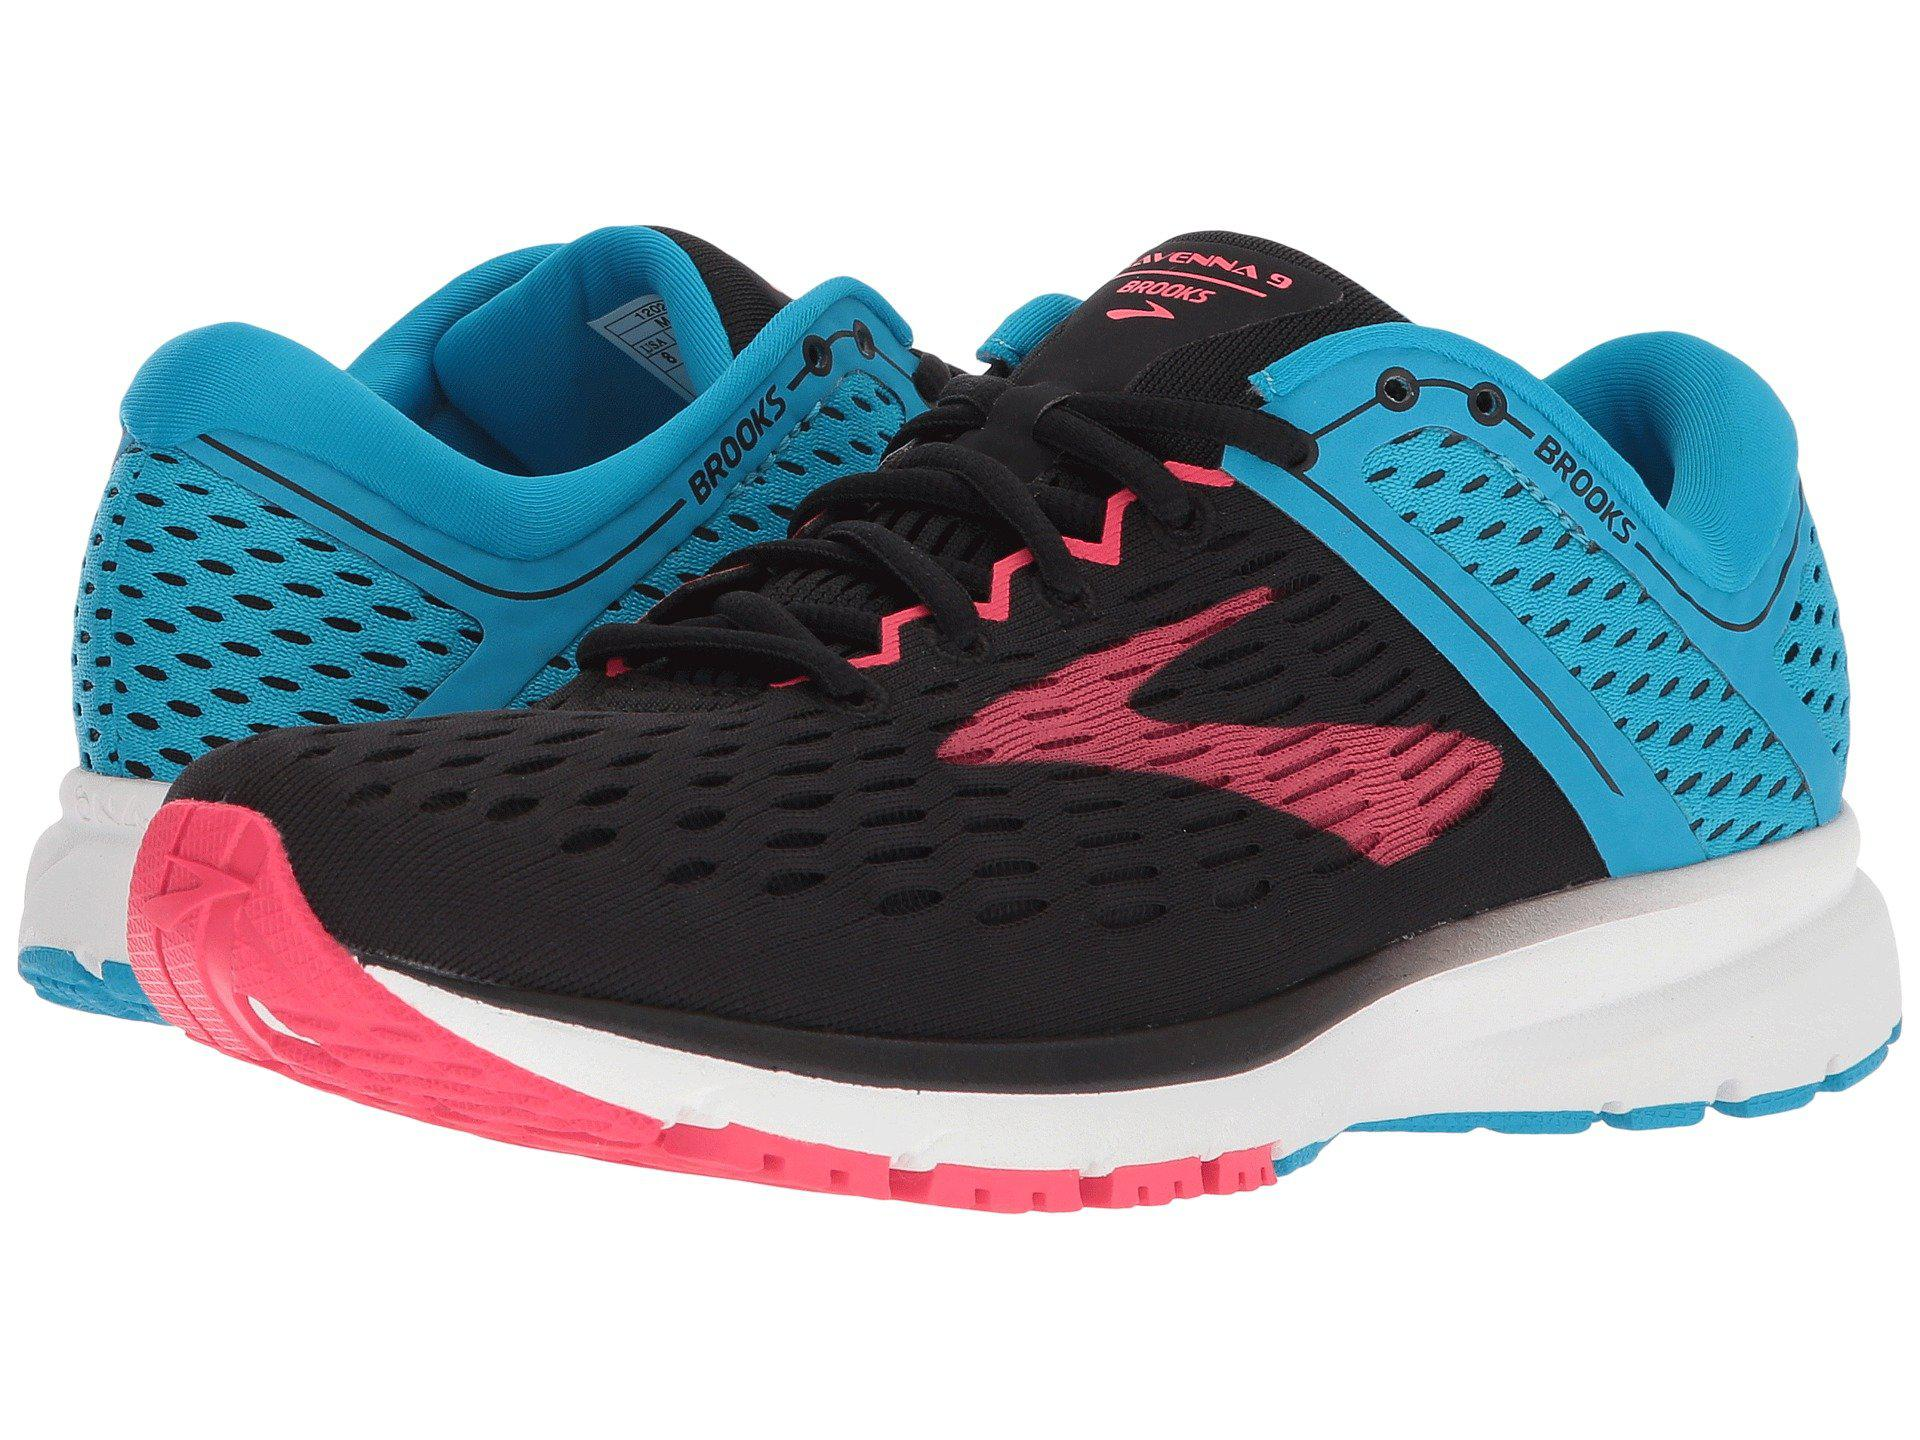 82359f1c8215b Brooks - Ravenna 9 (black blue pink) Women s Running Shoes - Lyst. View  fullscreen